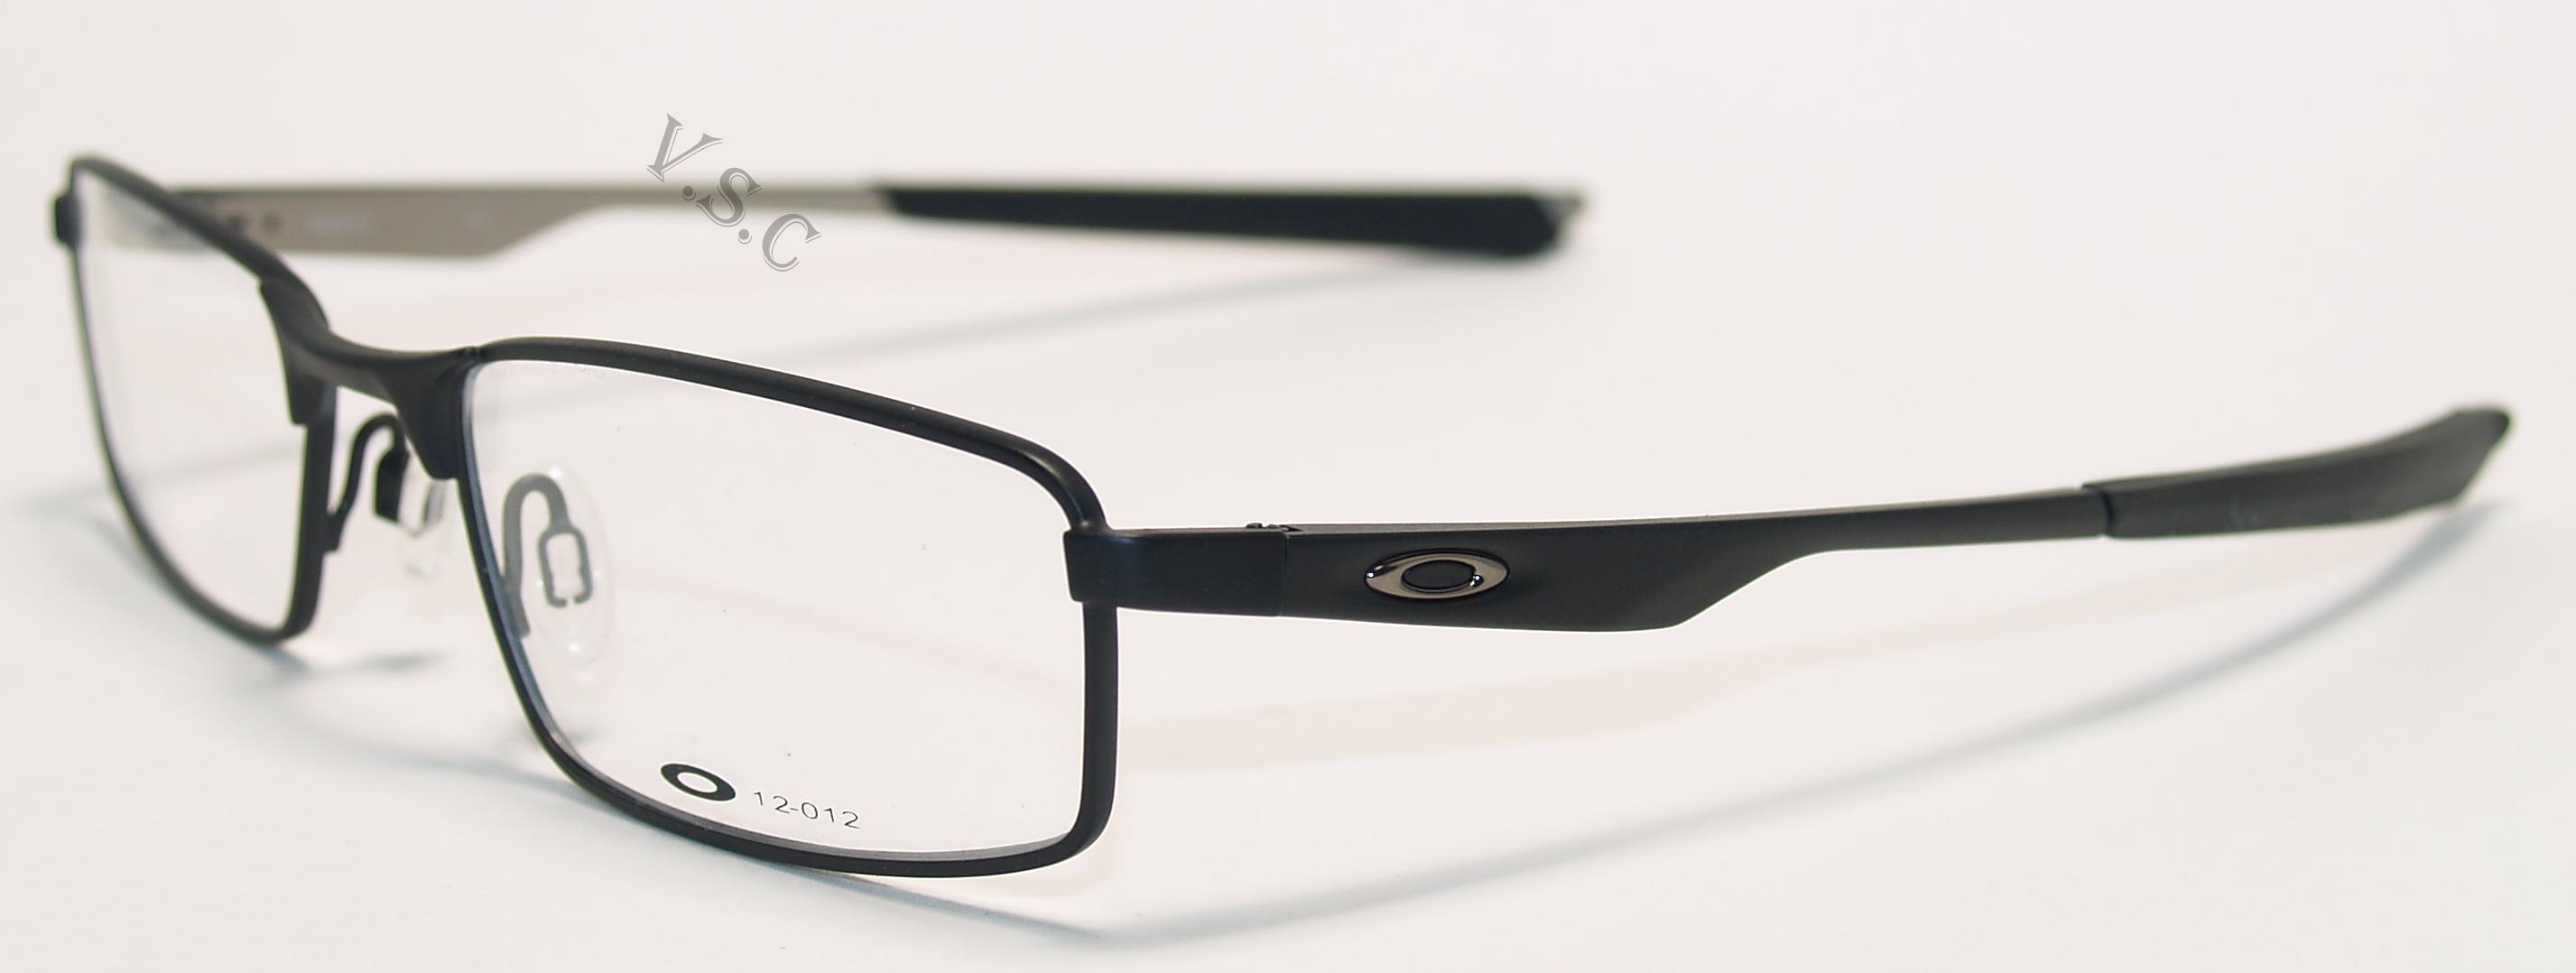 12b8f136f3a Oakley Blender Rx Frames « Heritage Malta